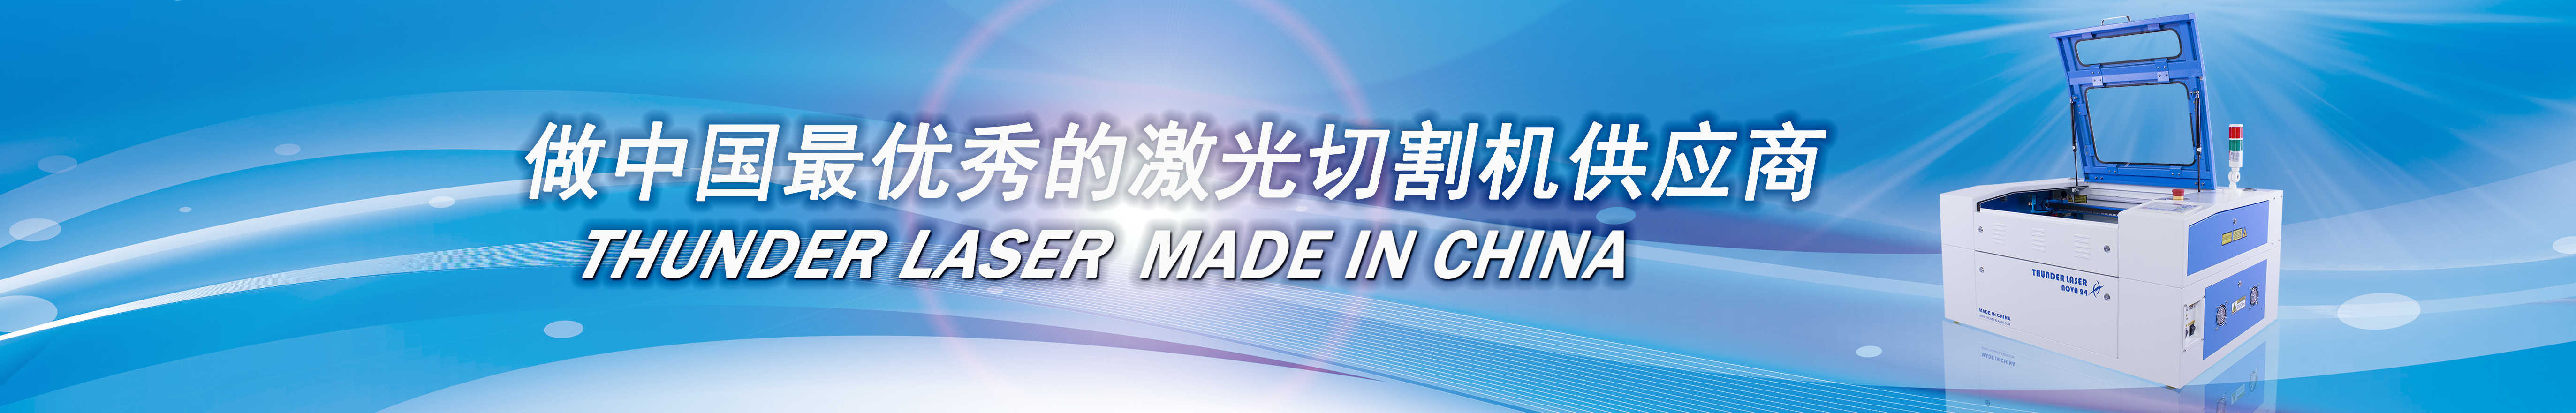 雷宇激光科技 banner